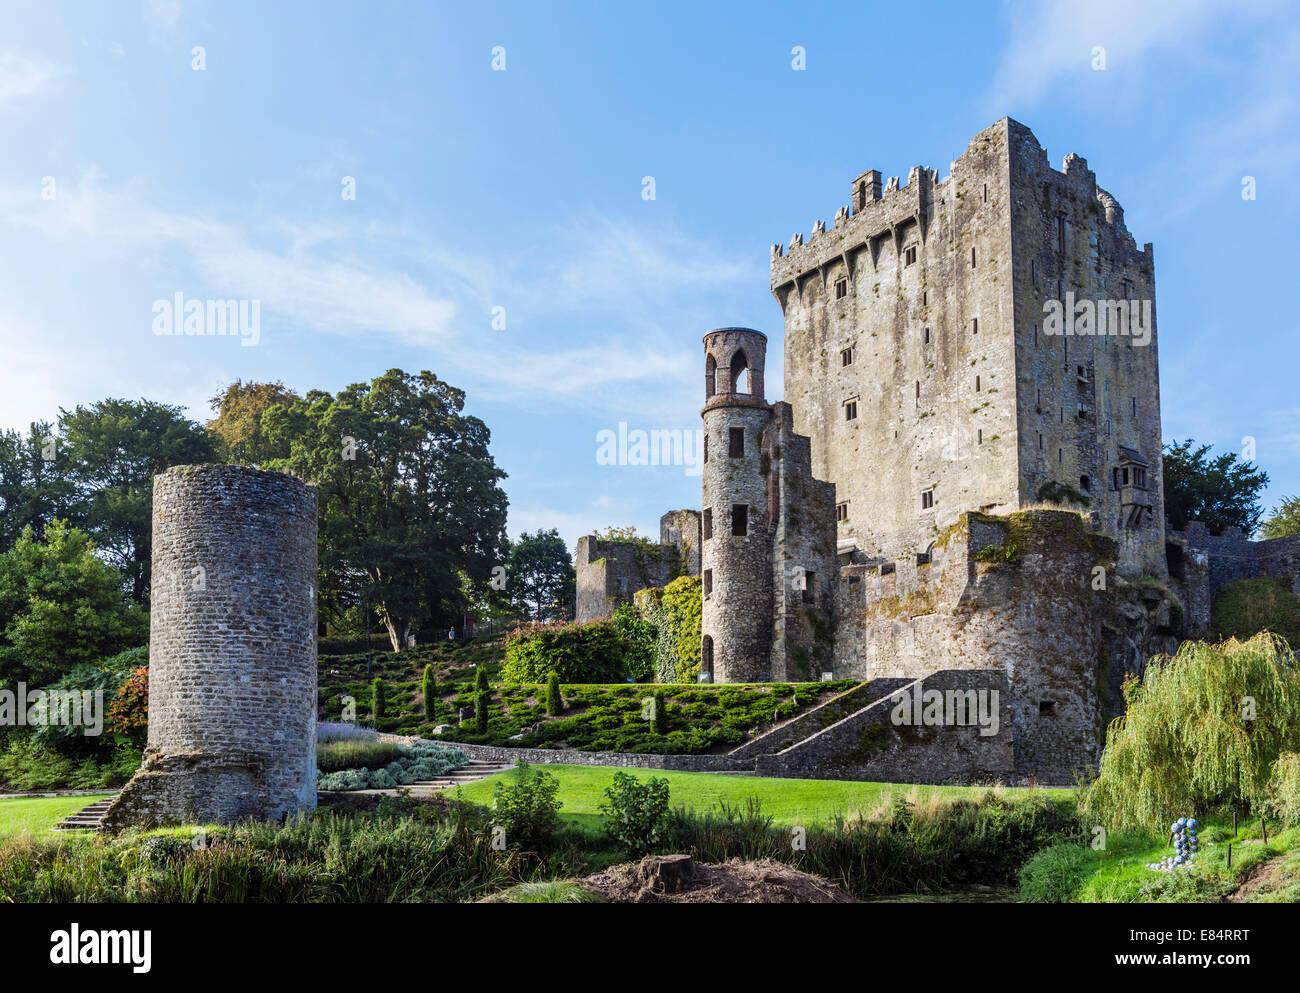 Blarney Castle, near Cork, County Cork, Republic of Ireland - Stock Image